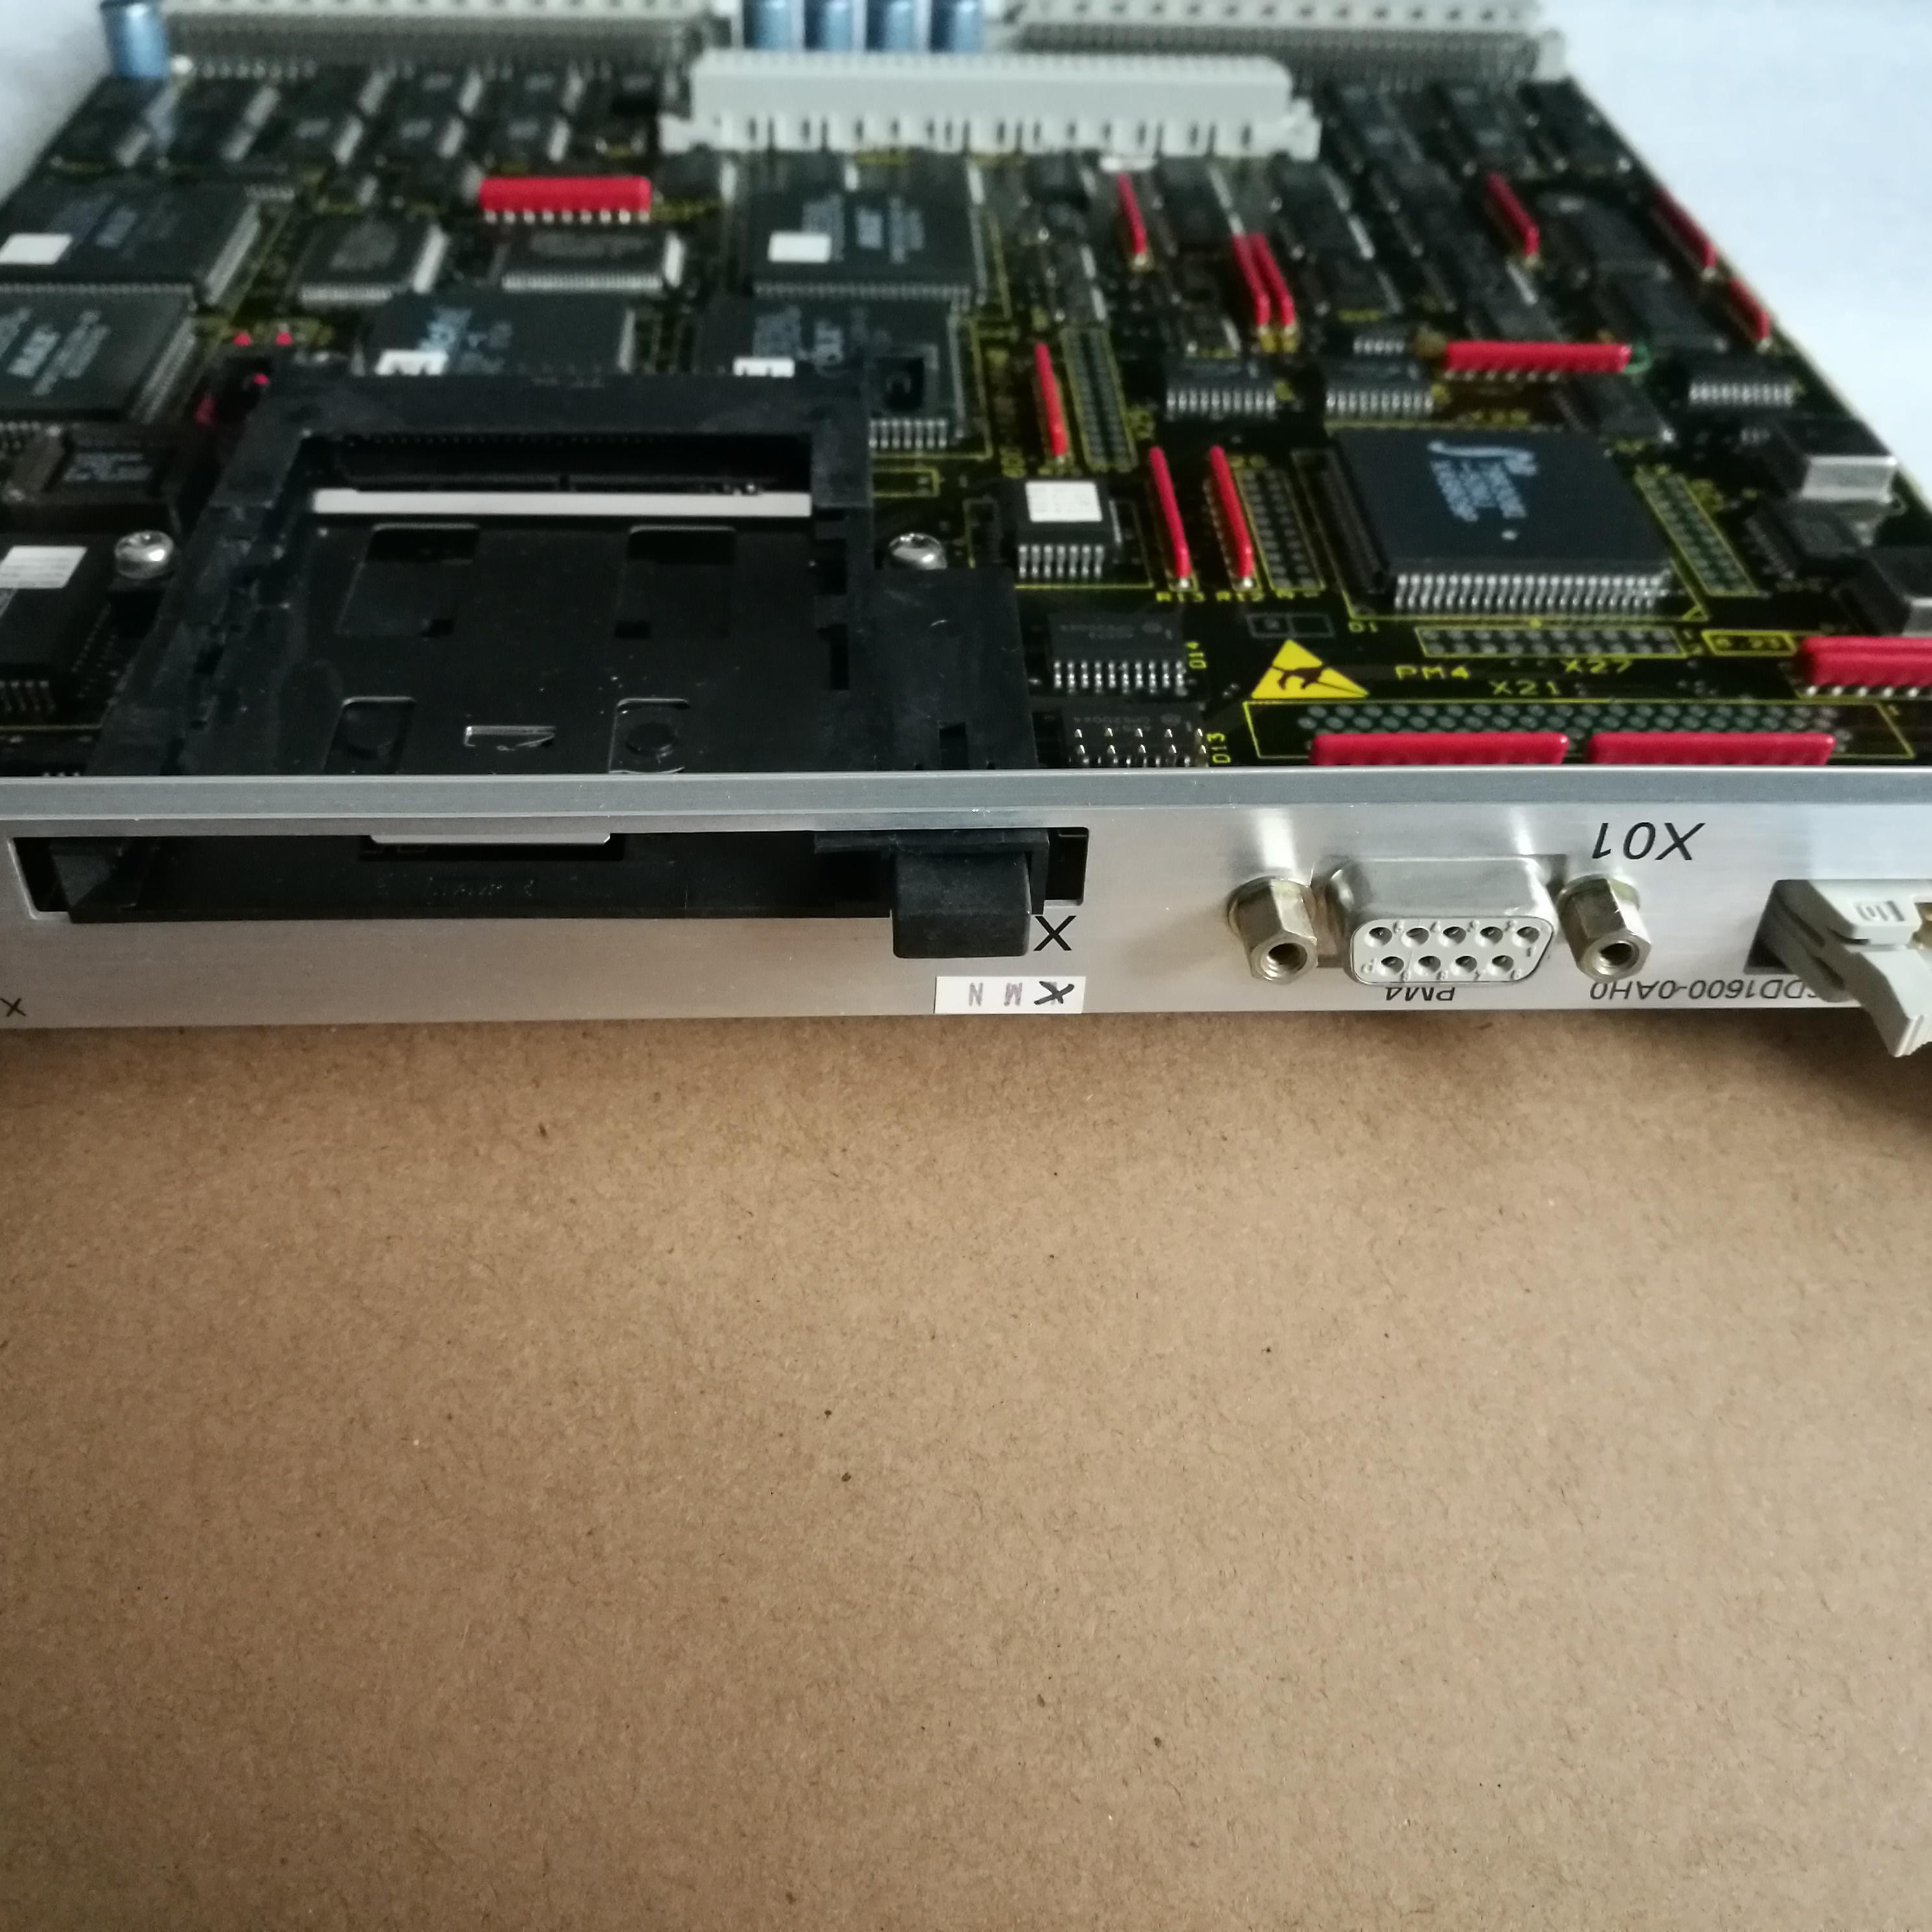 西门子 SIEMENS 模板 6DD1600-0AH0